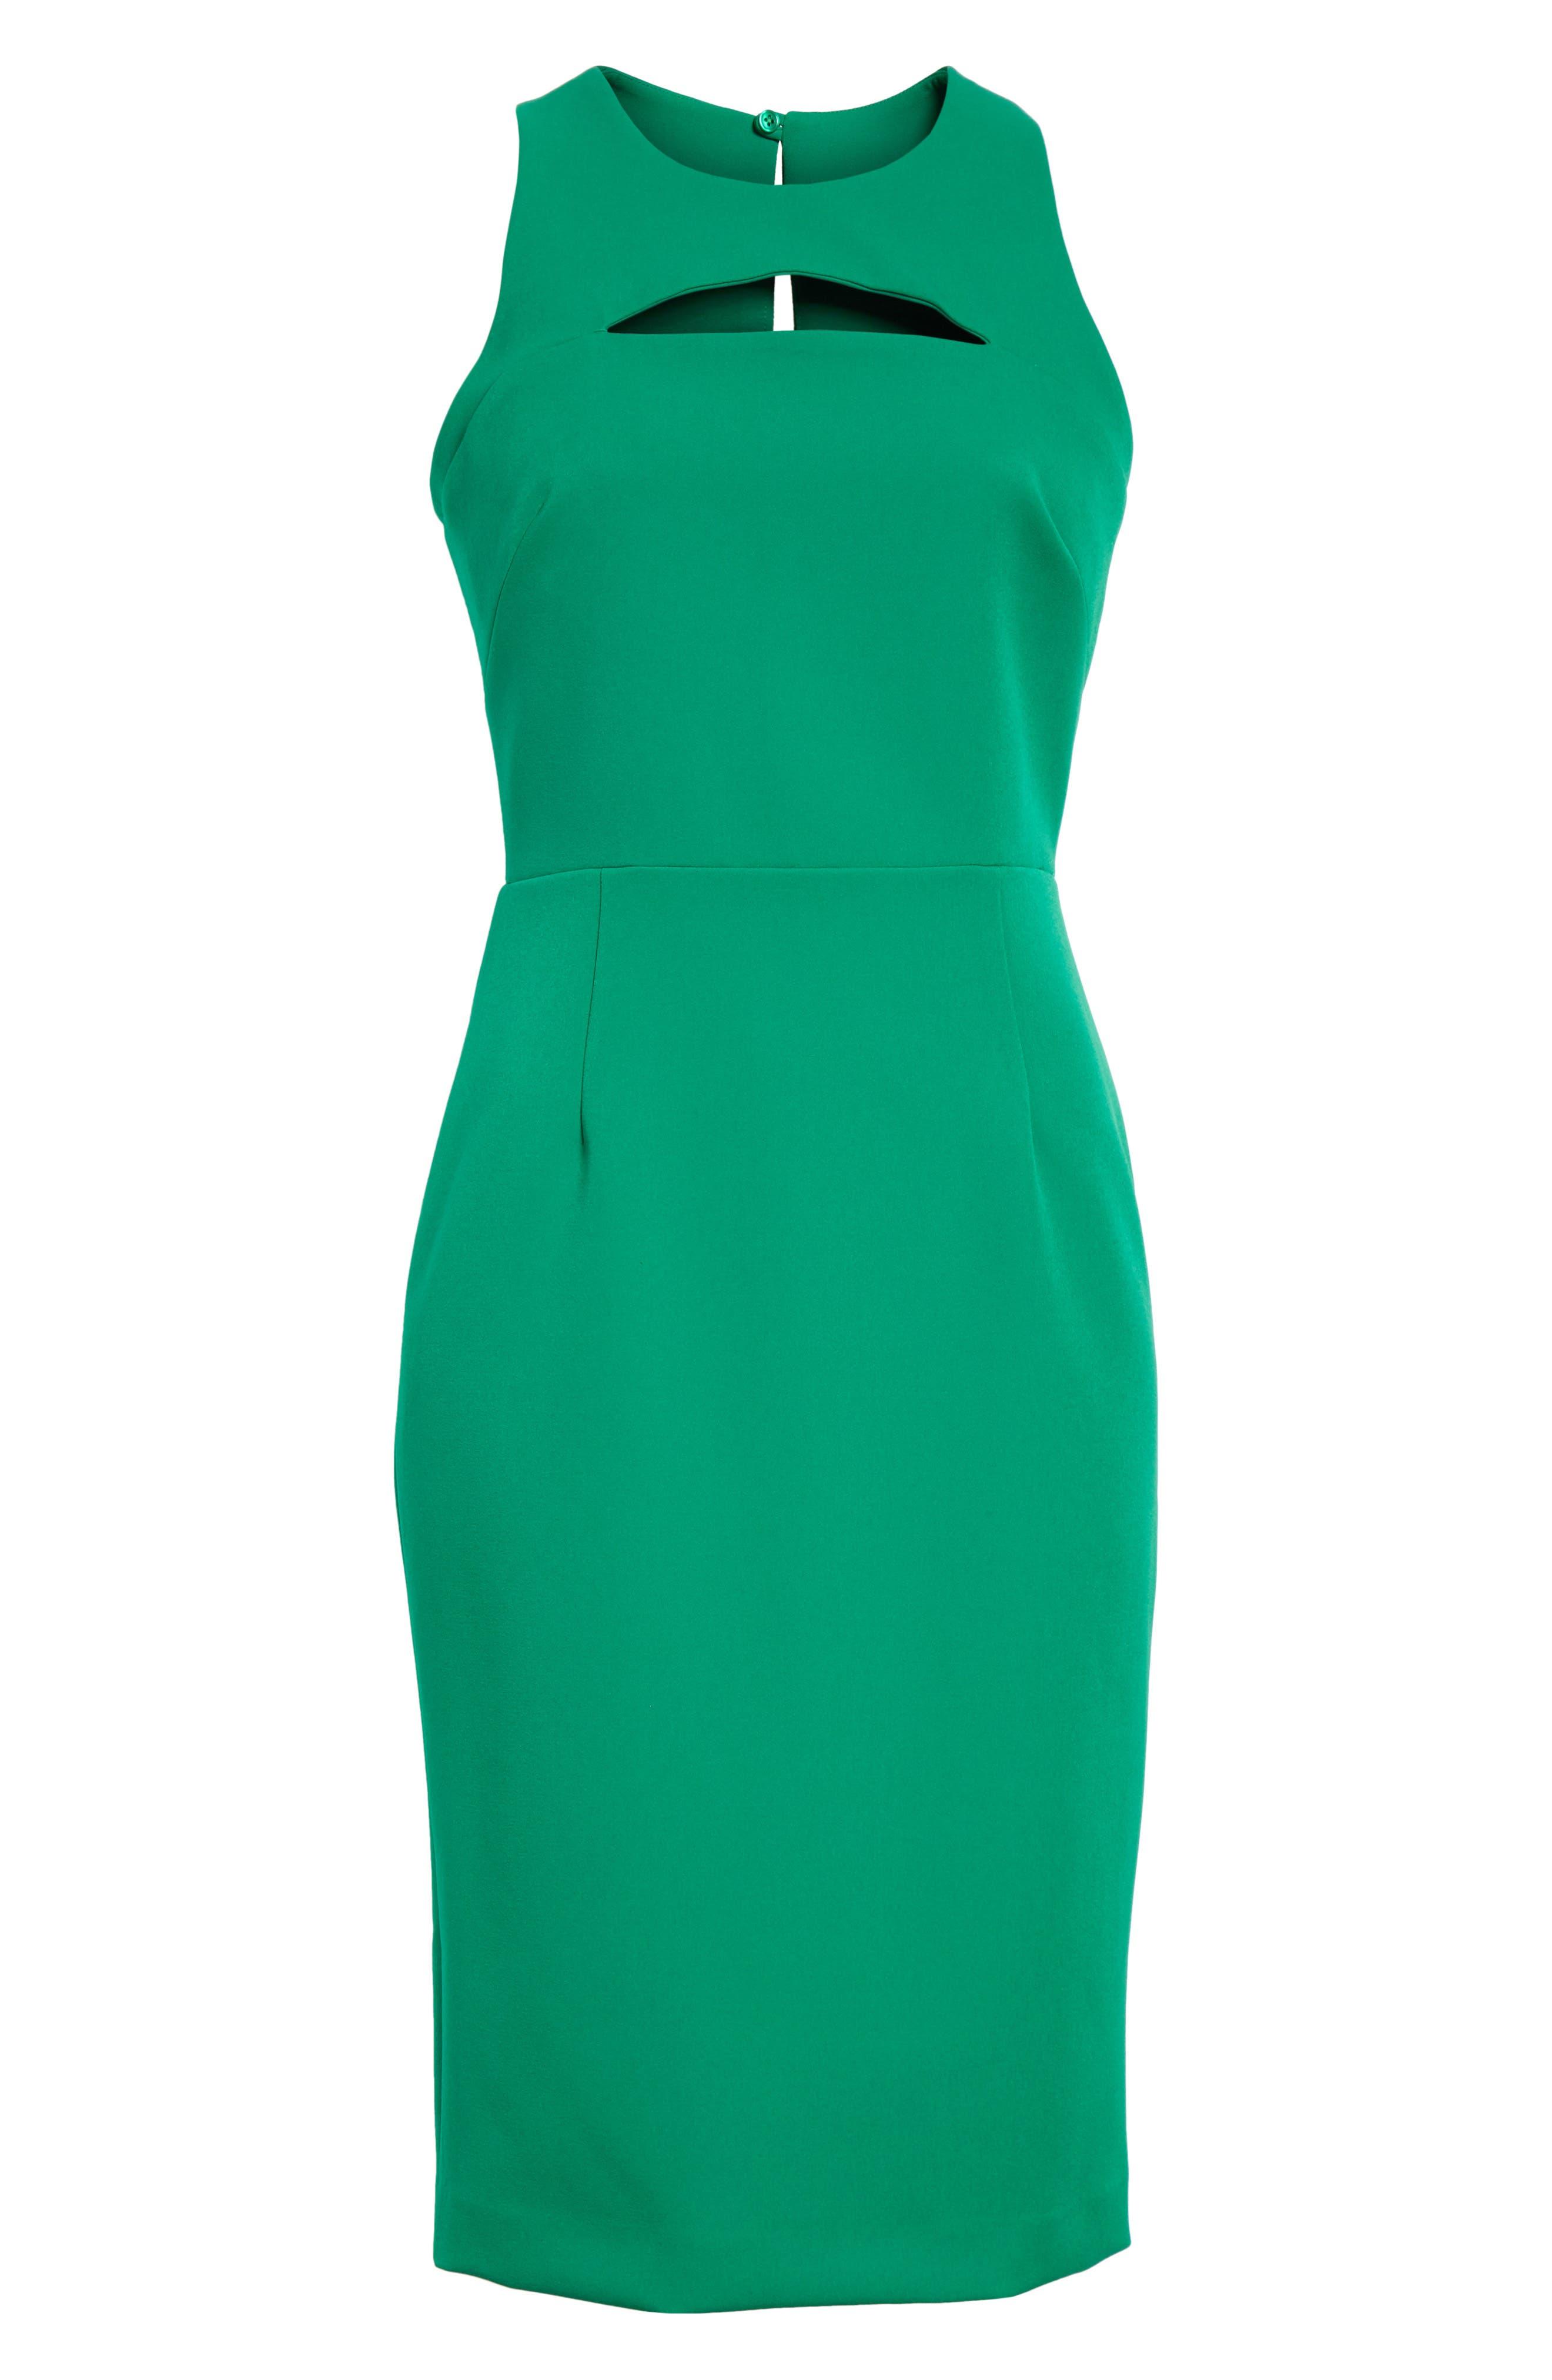 Luna Cutout Detail Crepe Sheath Dress,                             Alternate thumbnail 6, color,                             Emerald